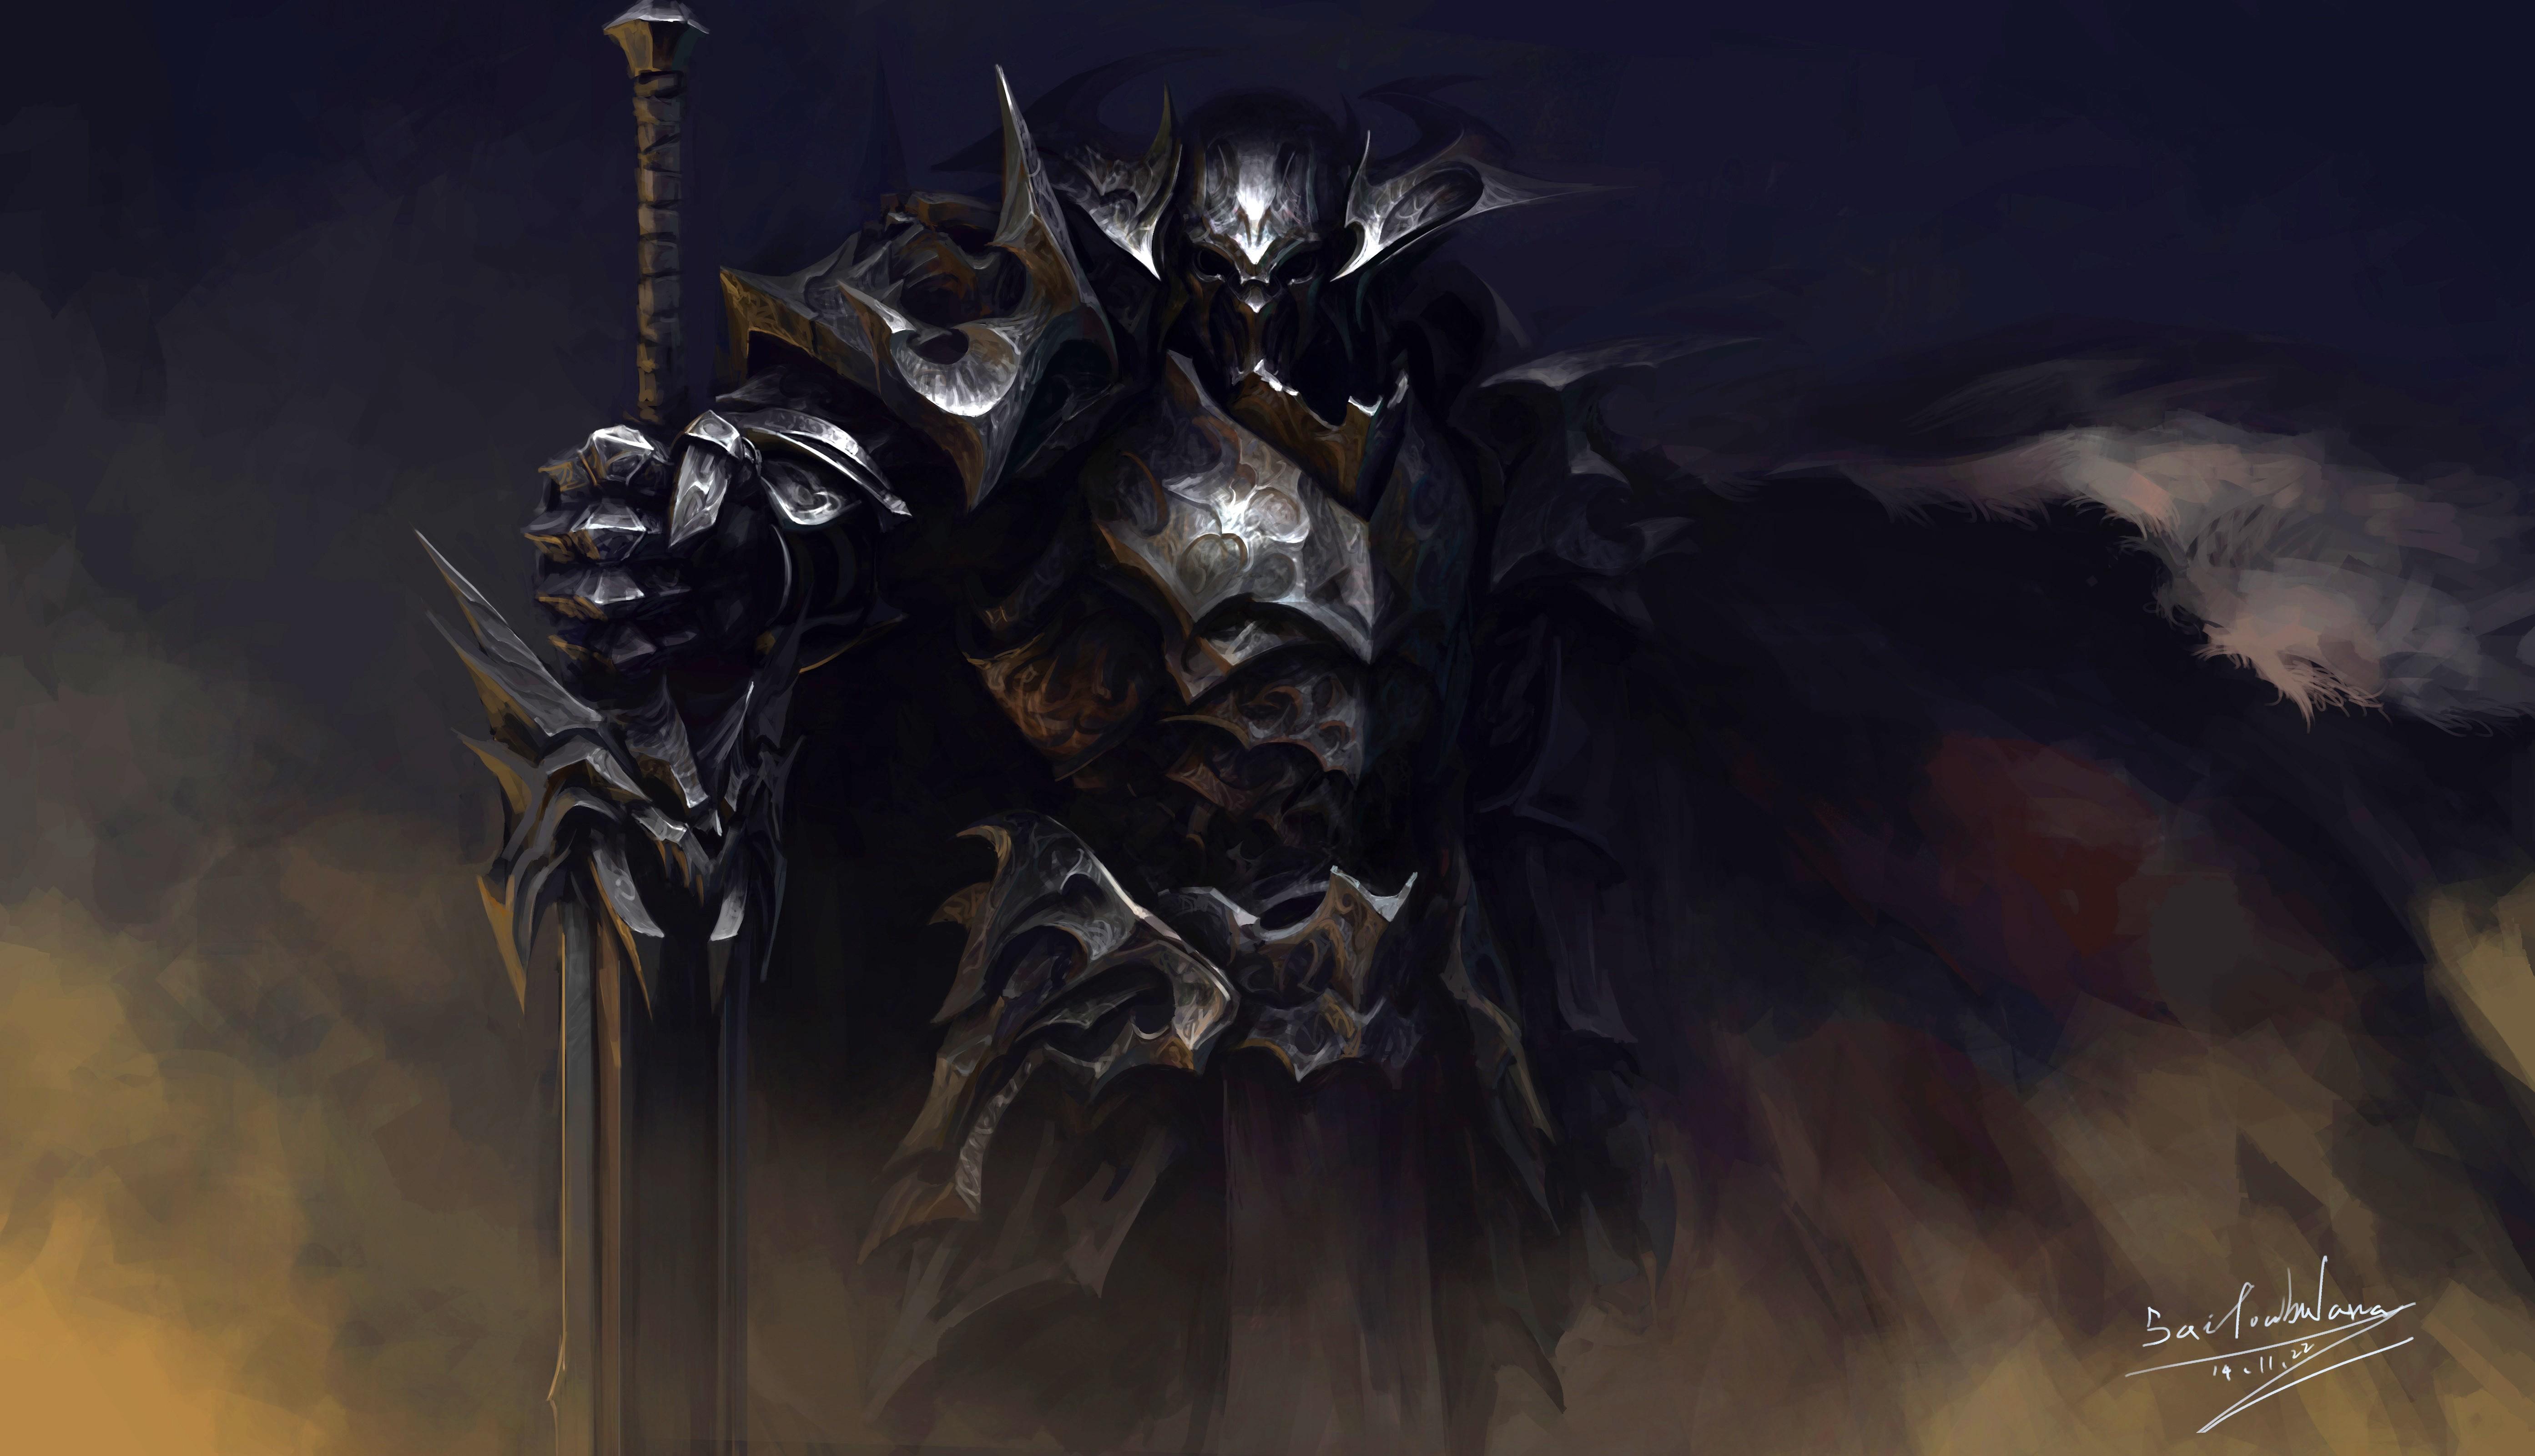 General 5573x3201 armor knight dark background fantasy art frontal view